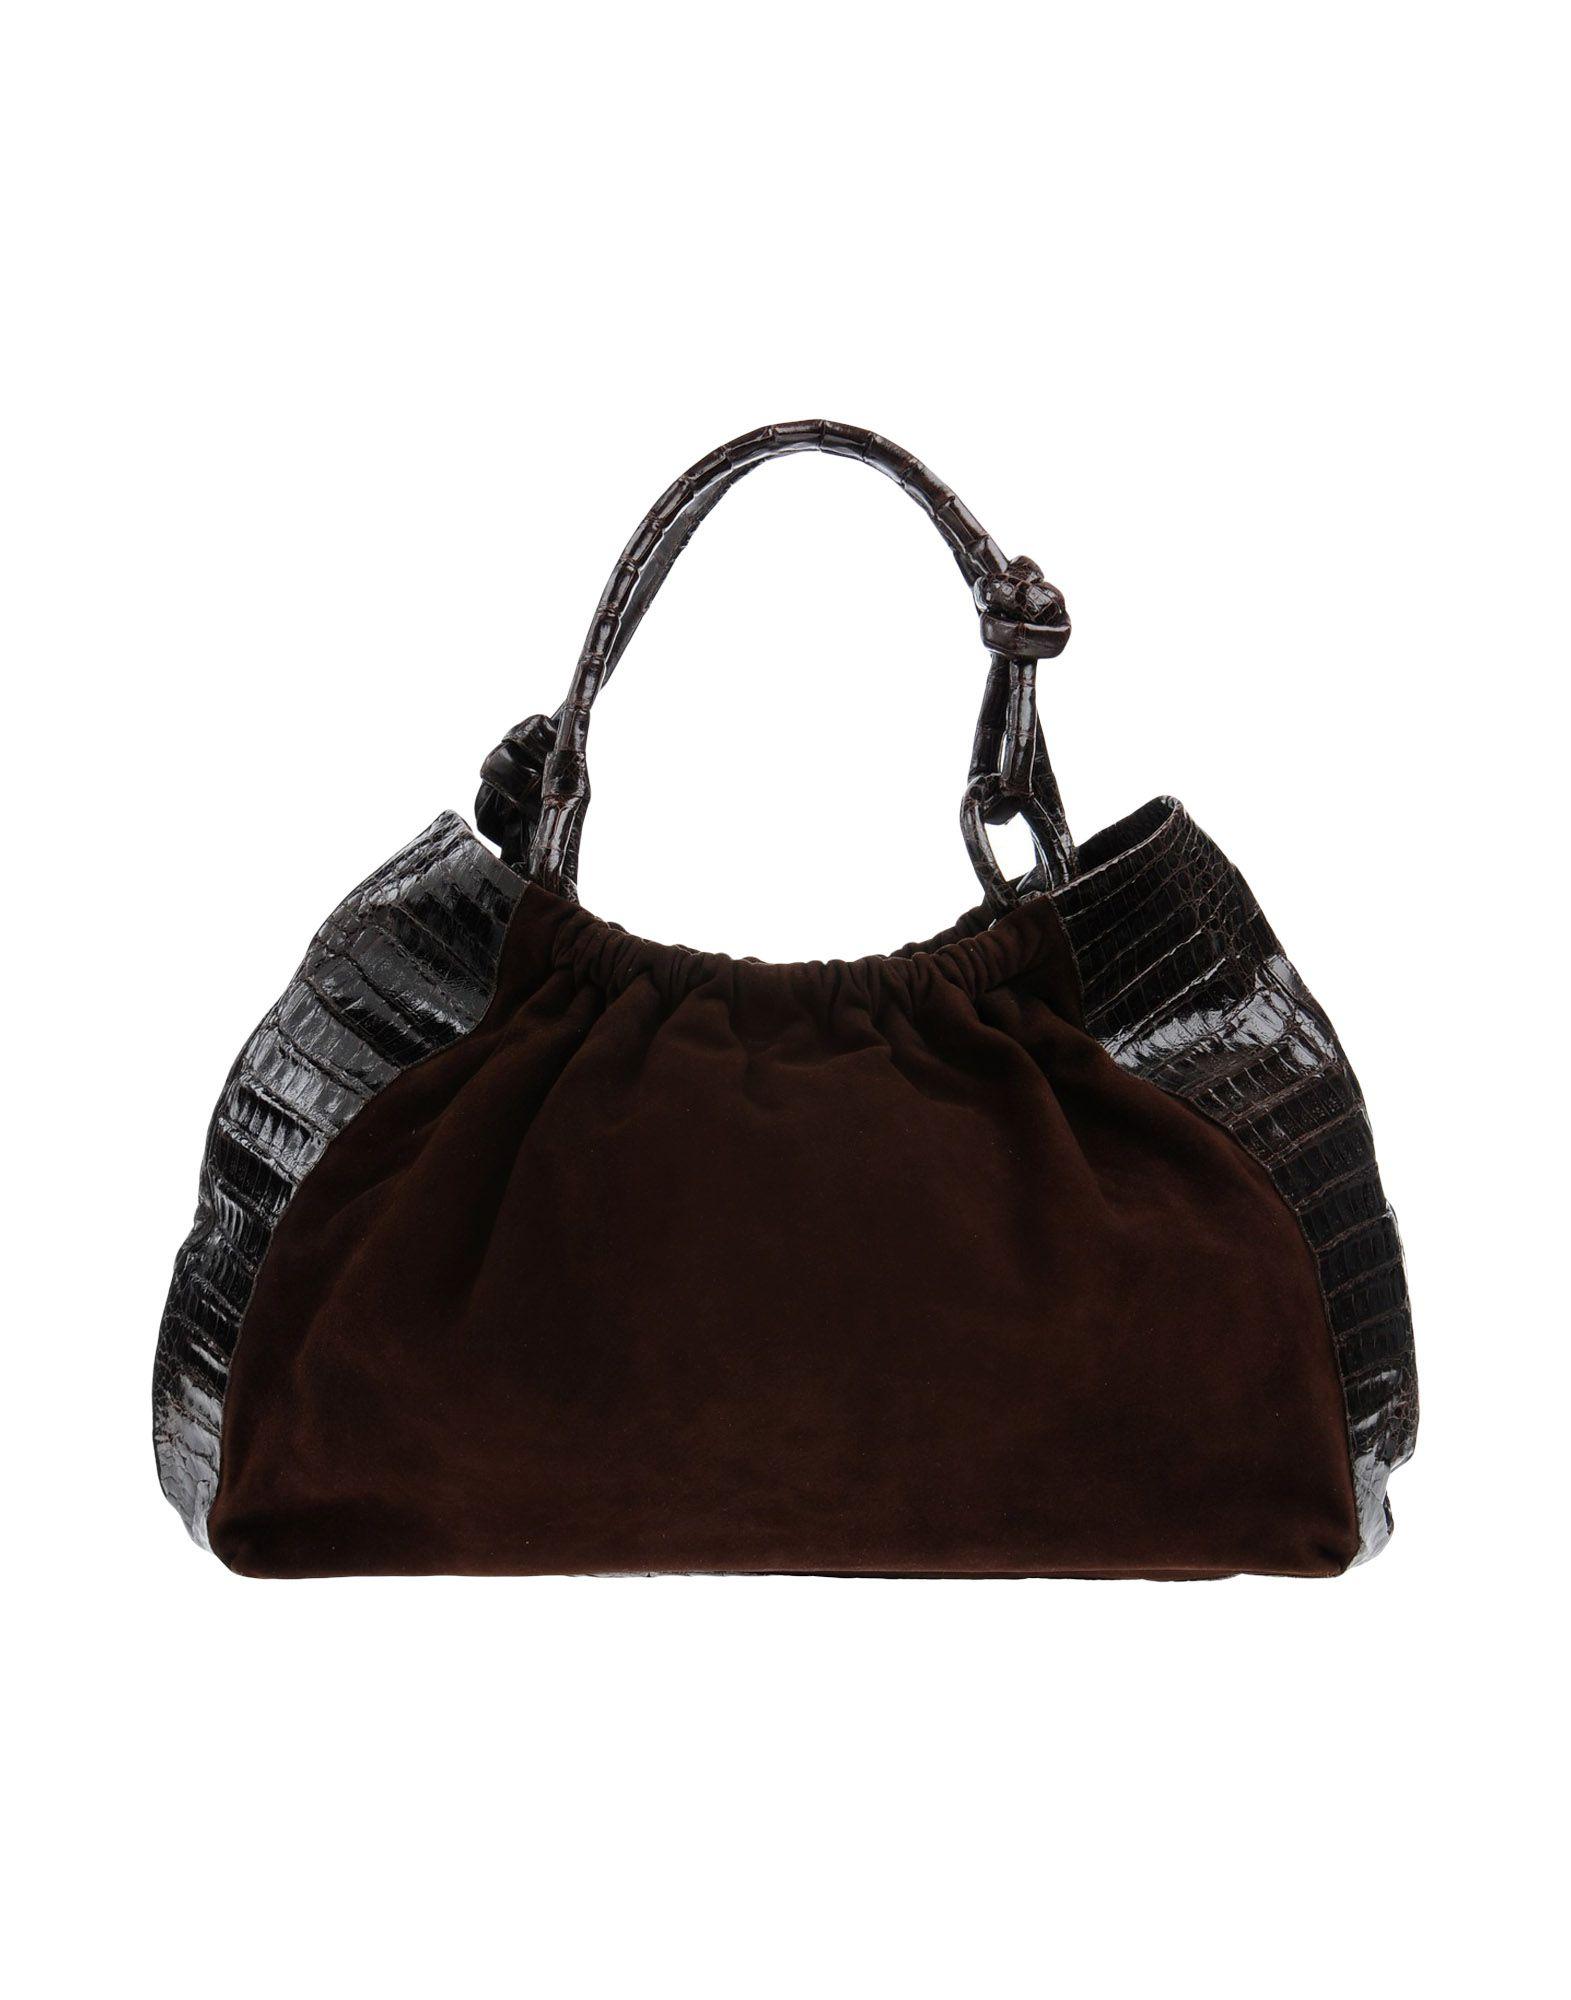 Al Duca D'Aosta HANDBAGS - Handbags su YOOX.COM Q68rHP0jMS